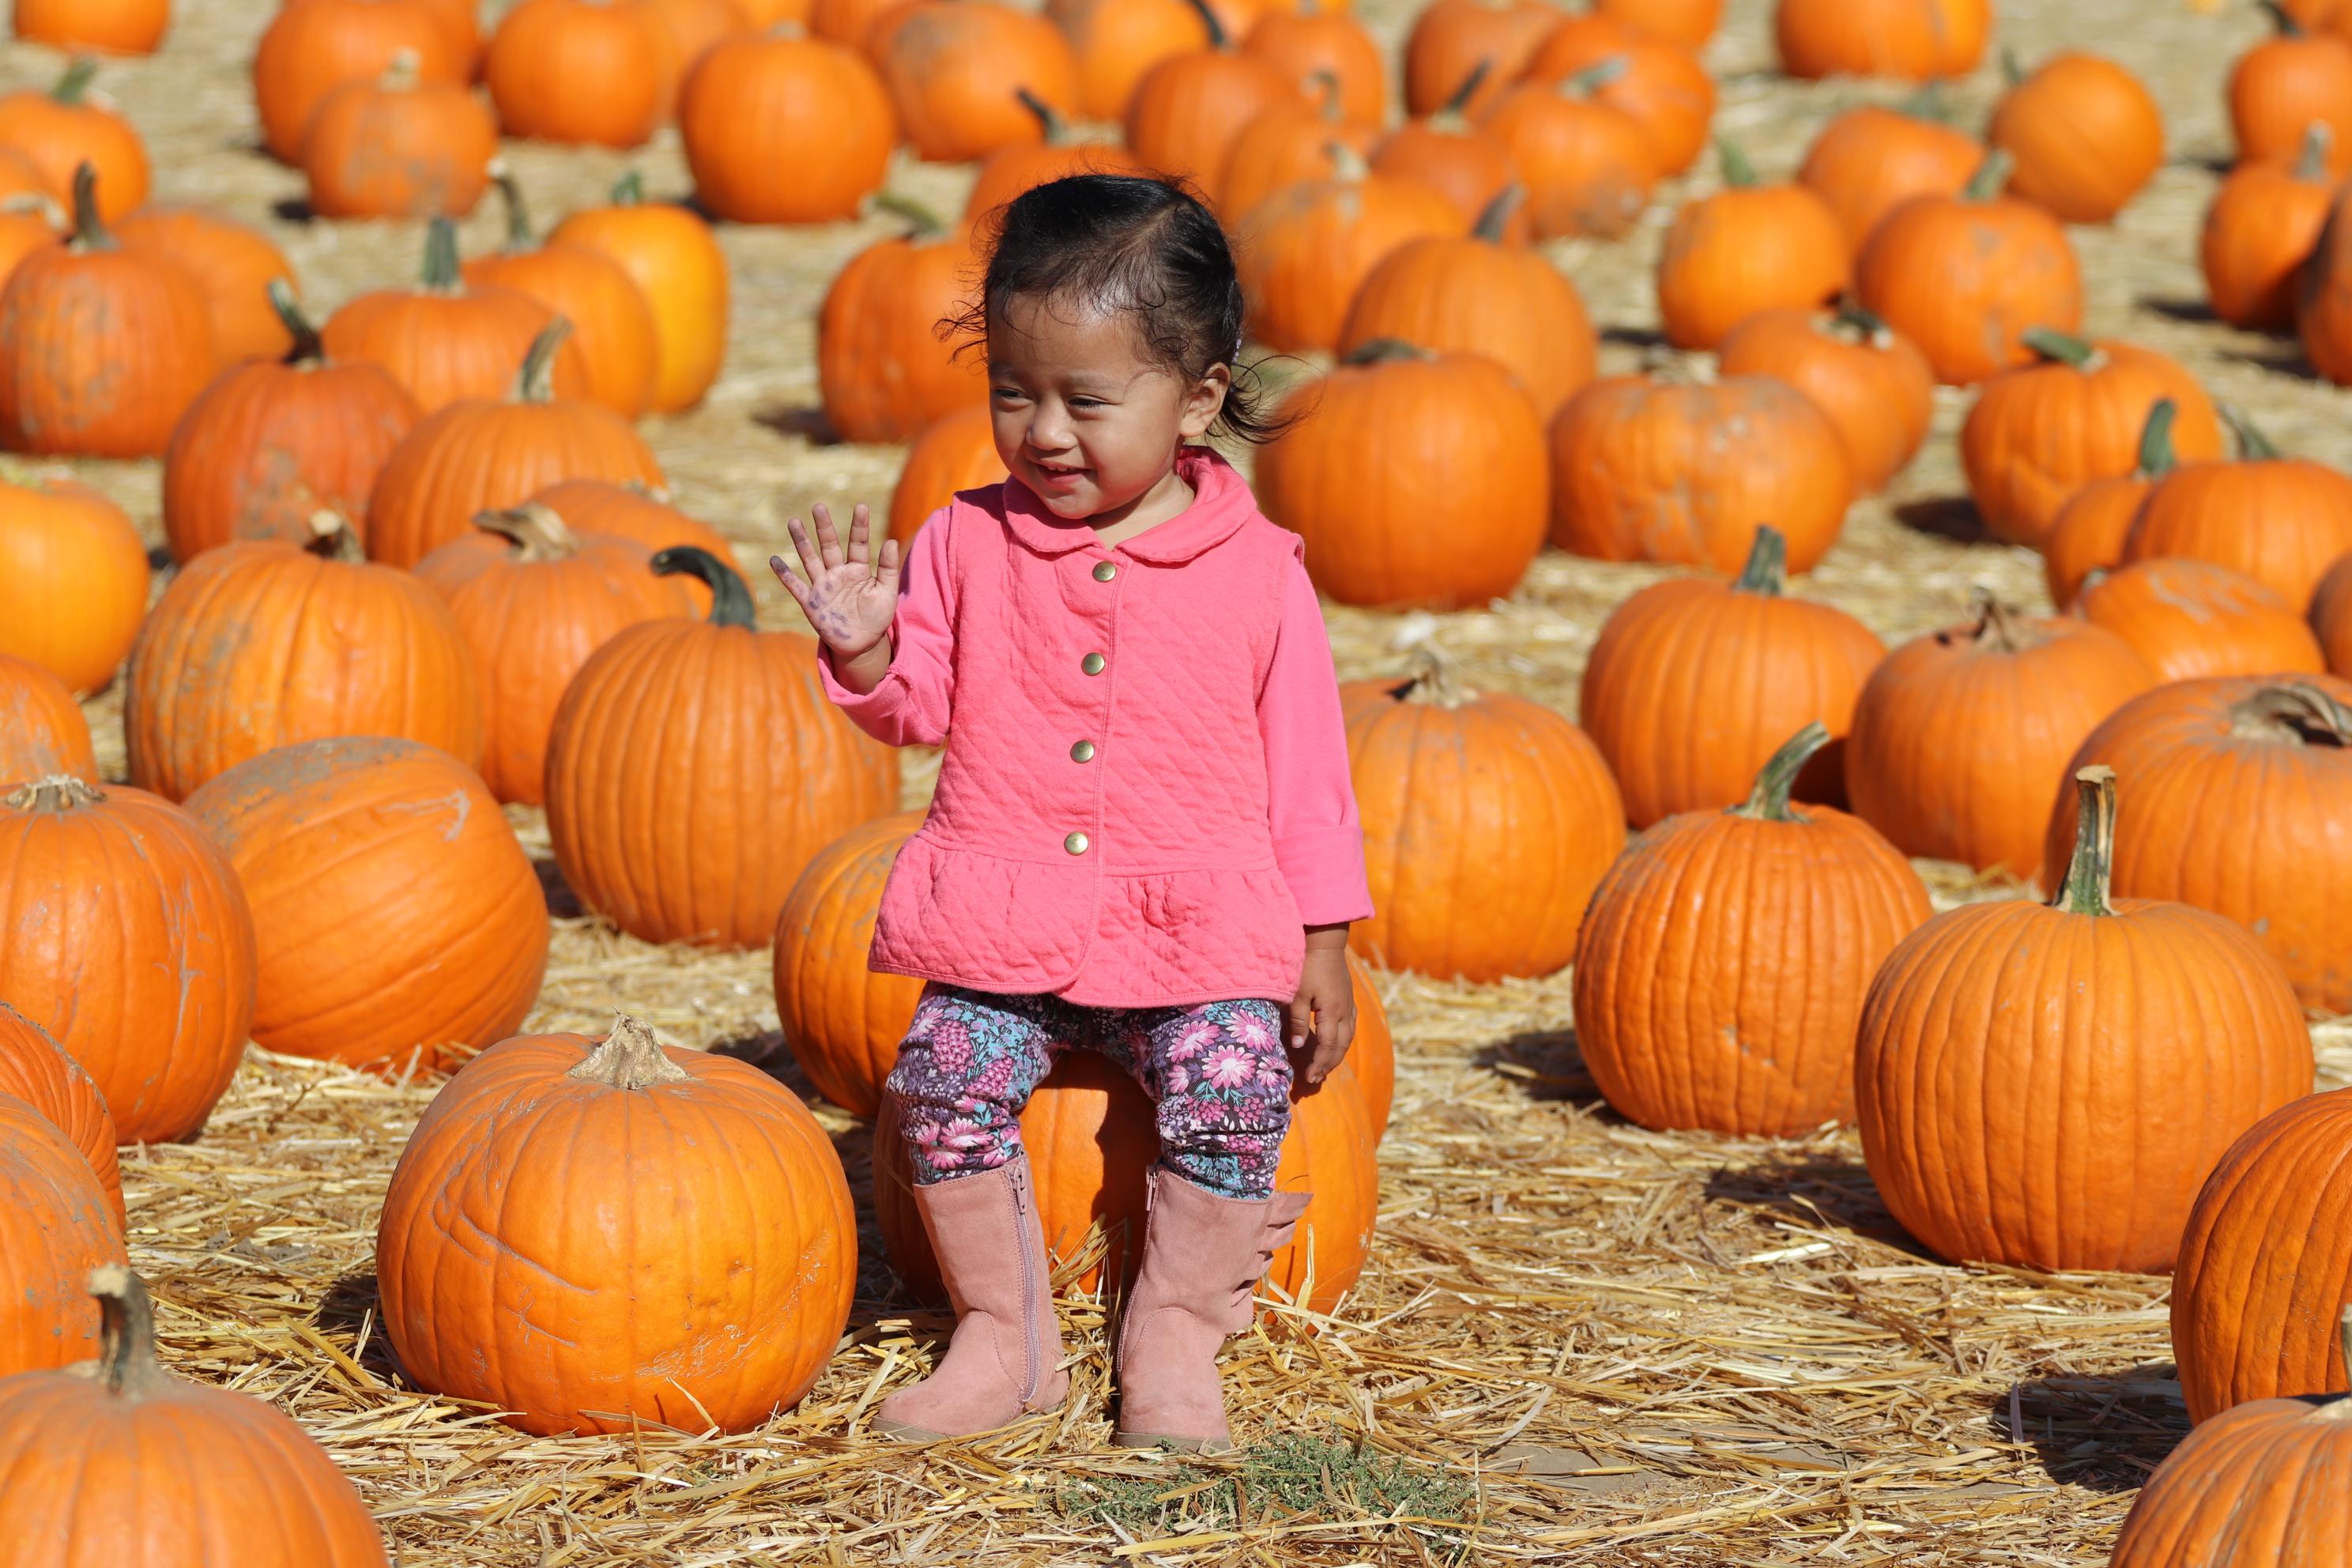 pumpkin patch at larry's produce